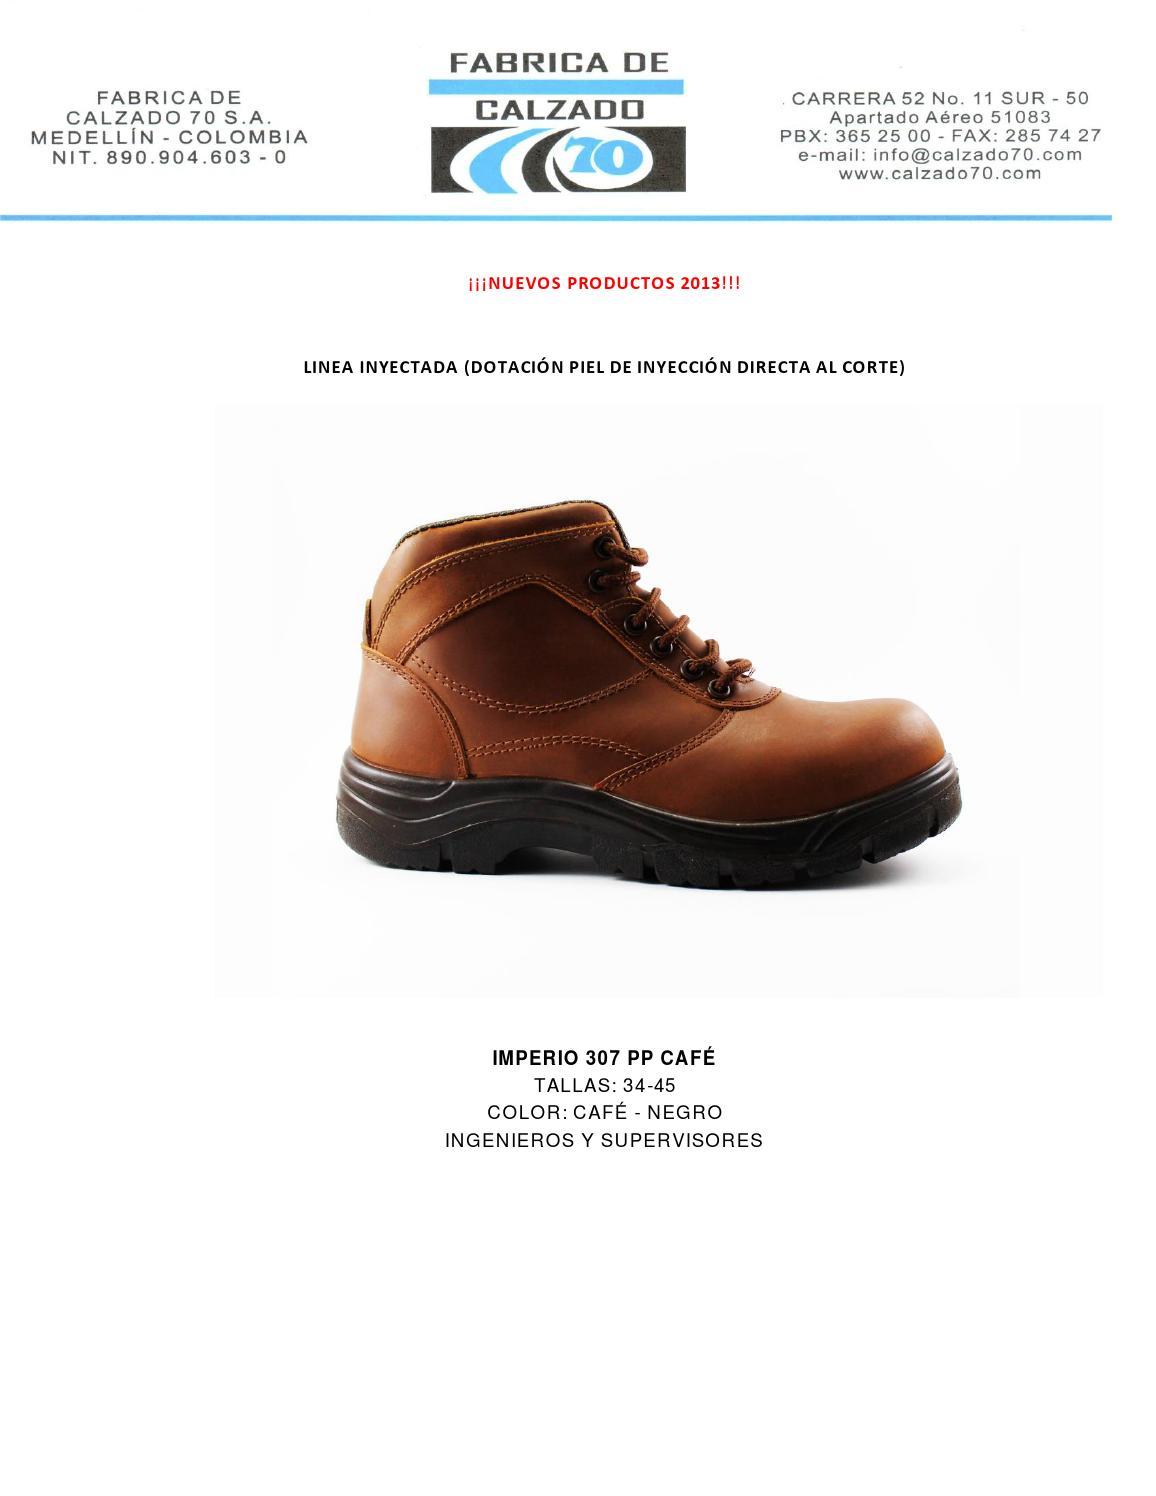 Sildenafil uk boots.doc - Calzado_70_virtual_inyectado 2 Years Ago Juancamiloserna